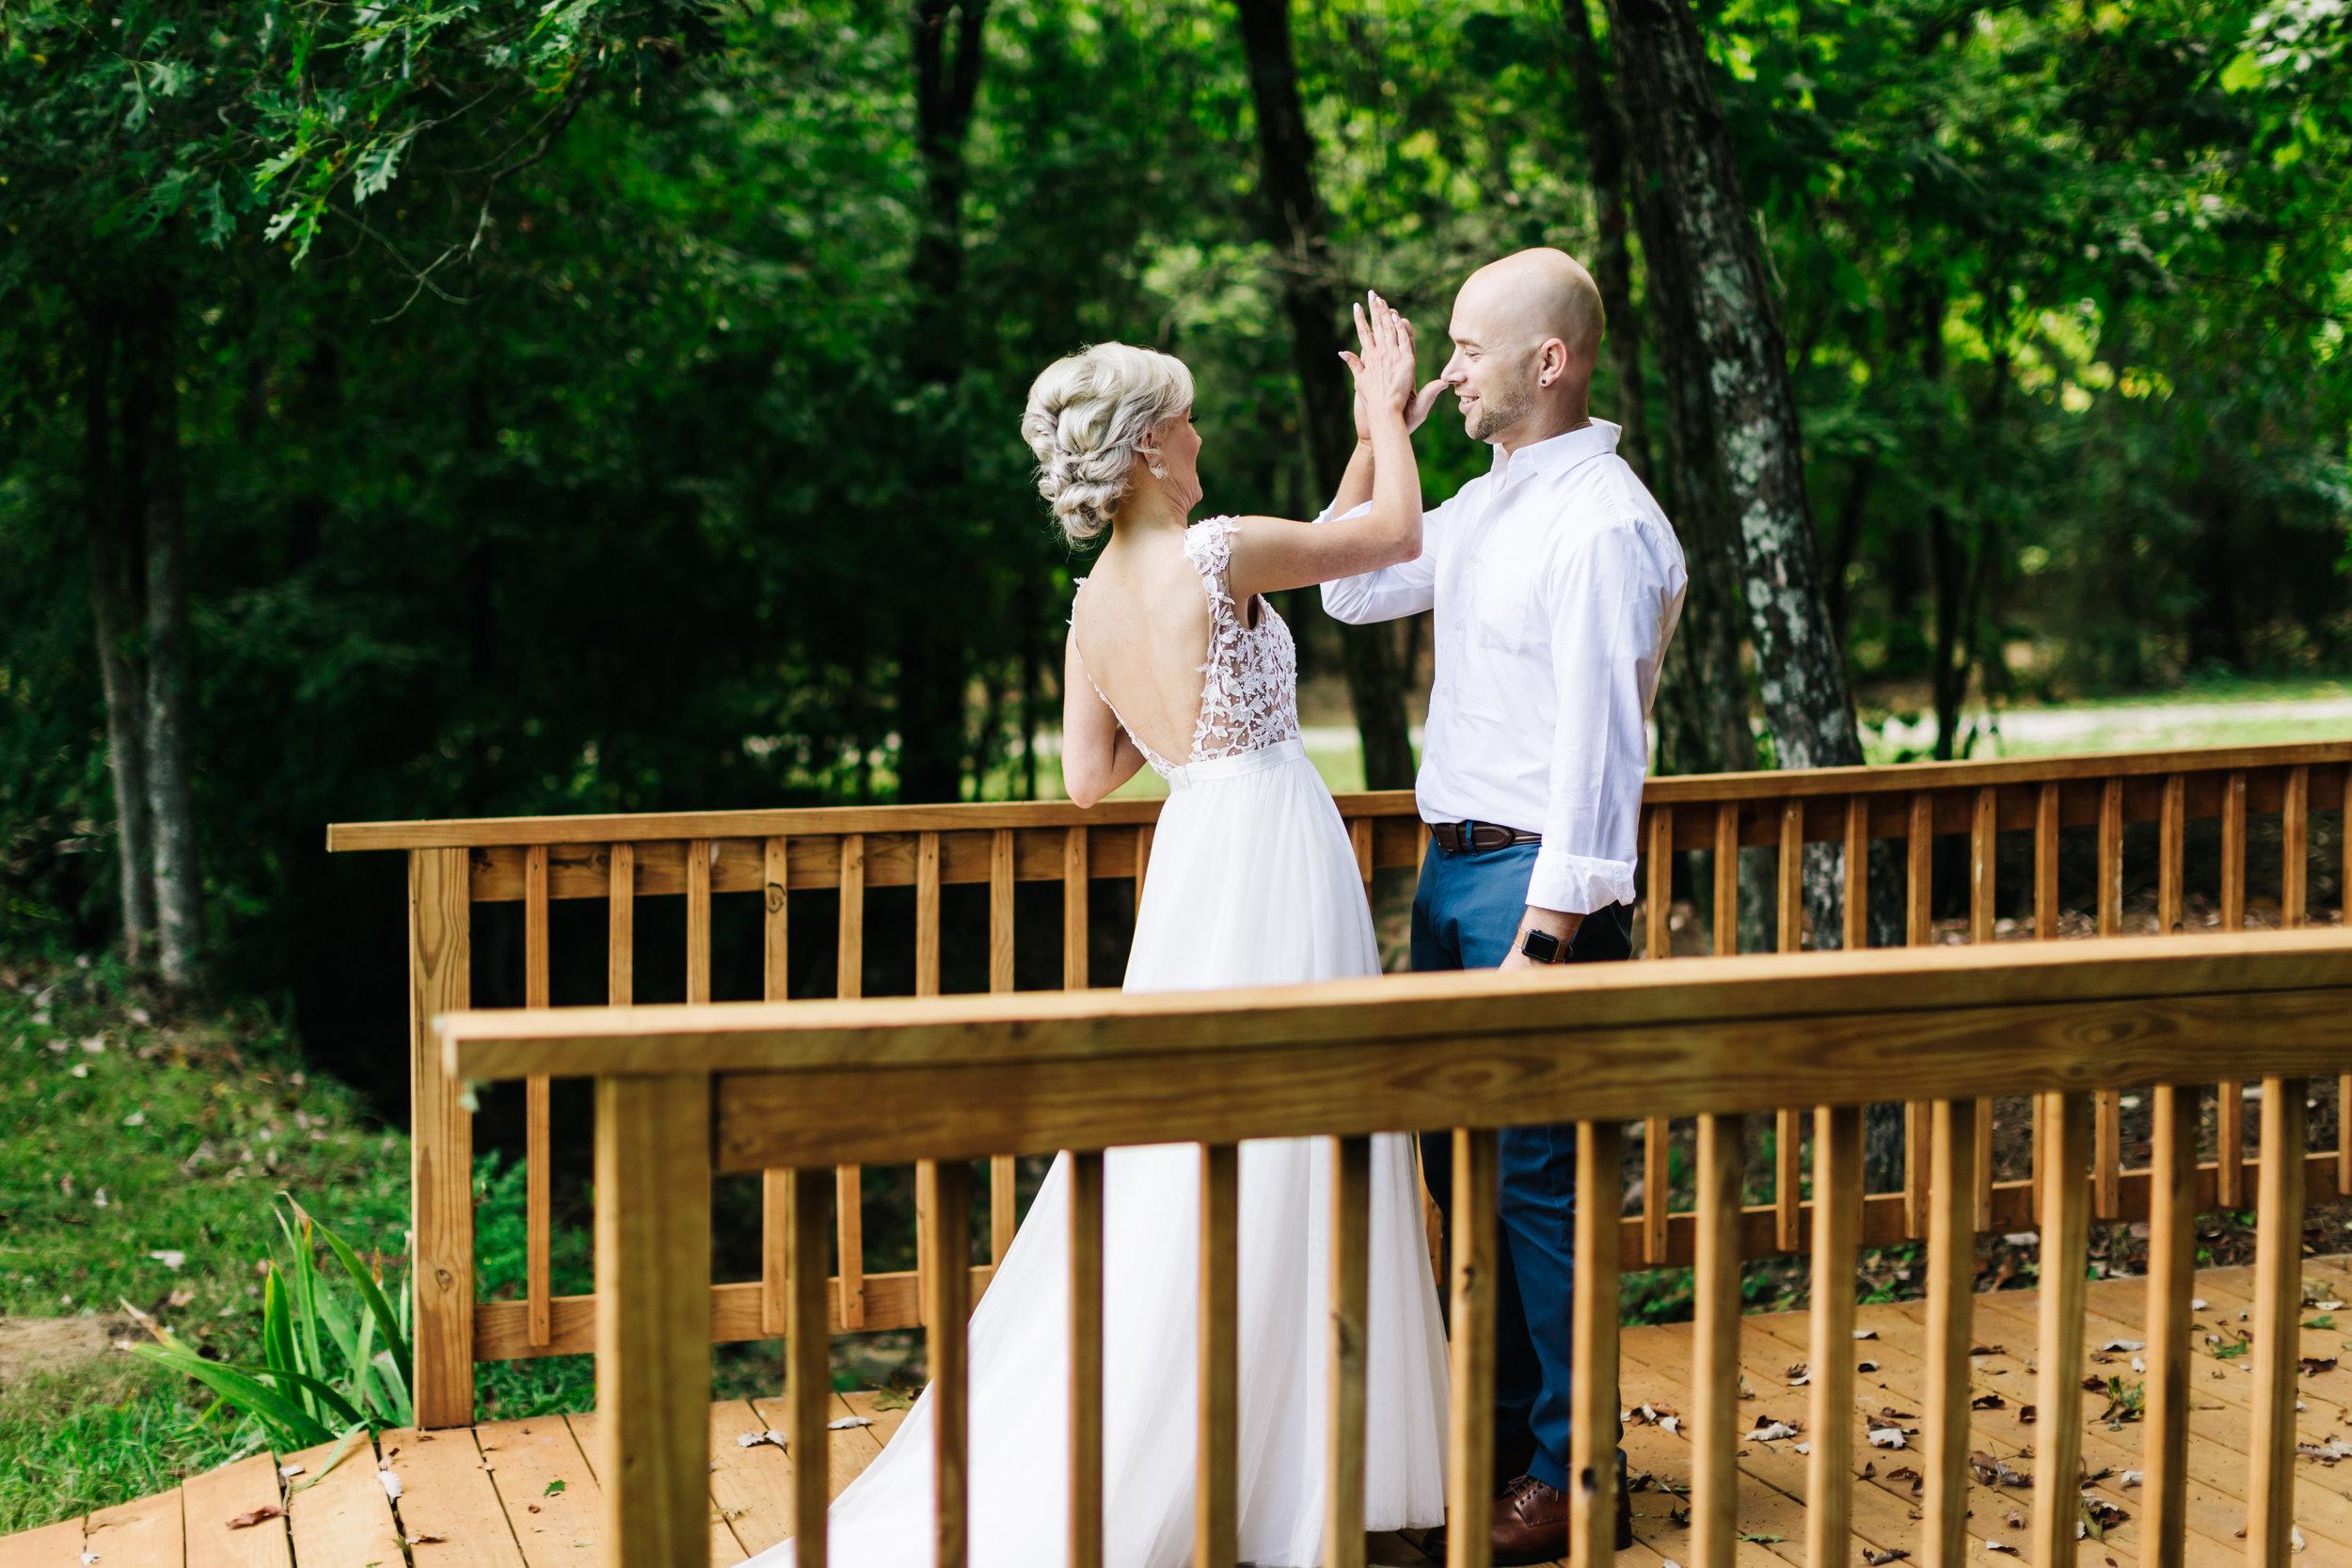 2018.09.02 Ray and Sarah Prizner Nashville TN Wedding FINALS-70.jpg